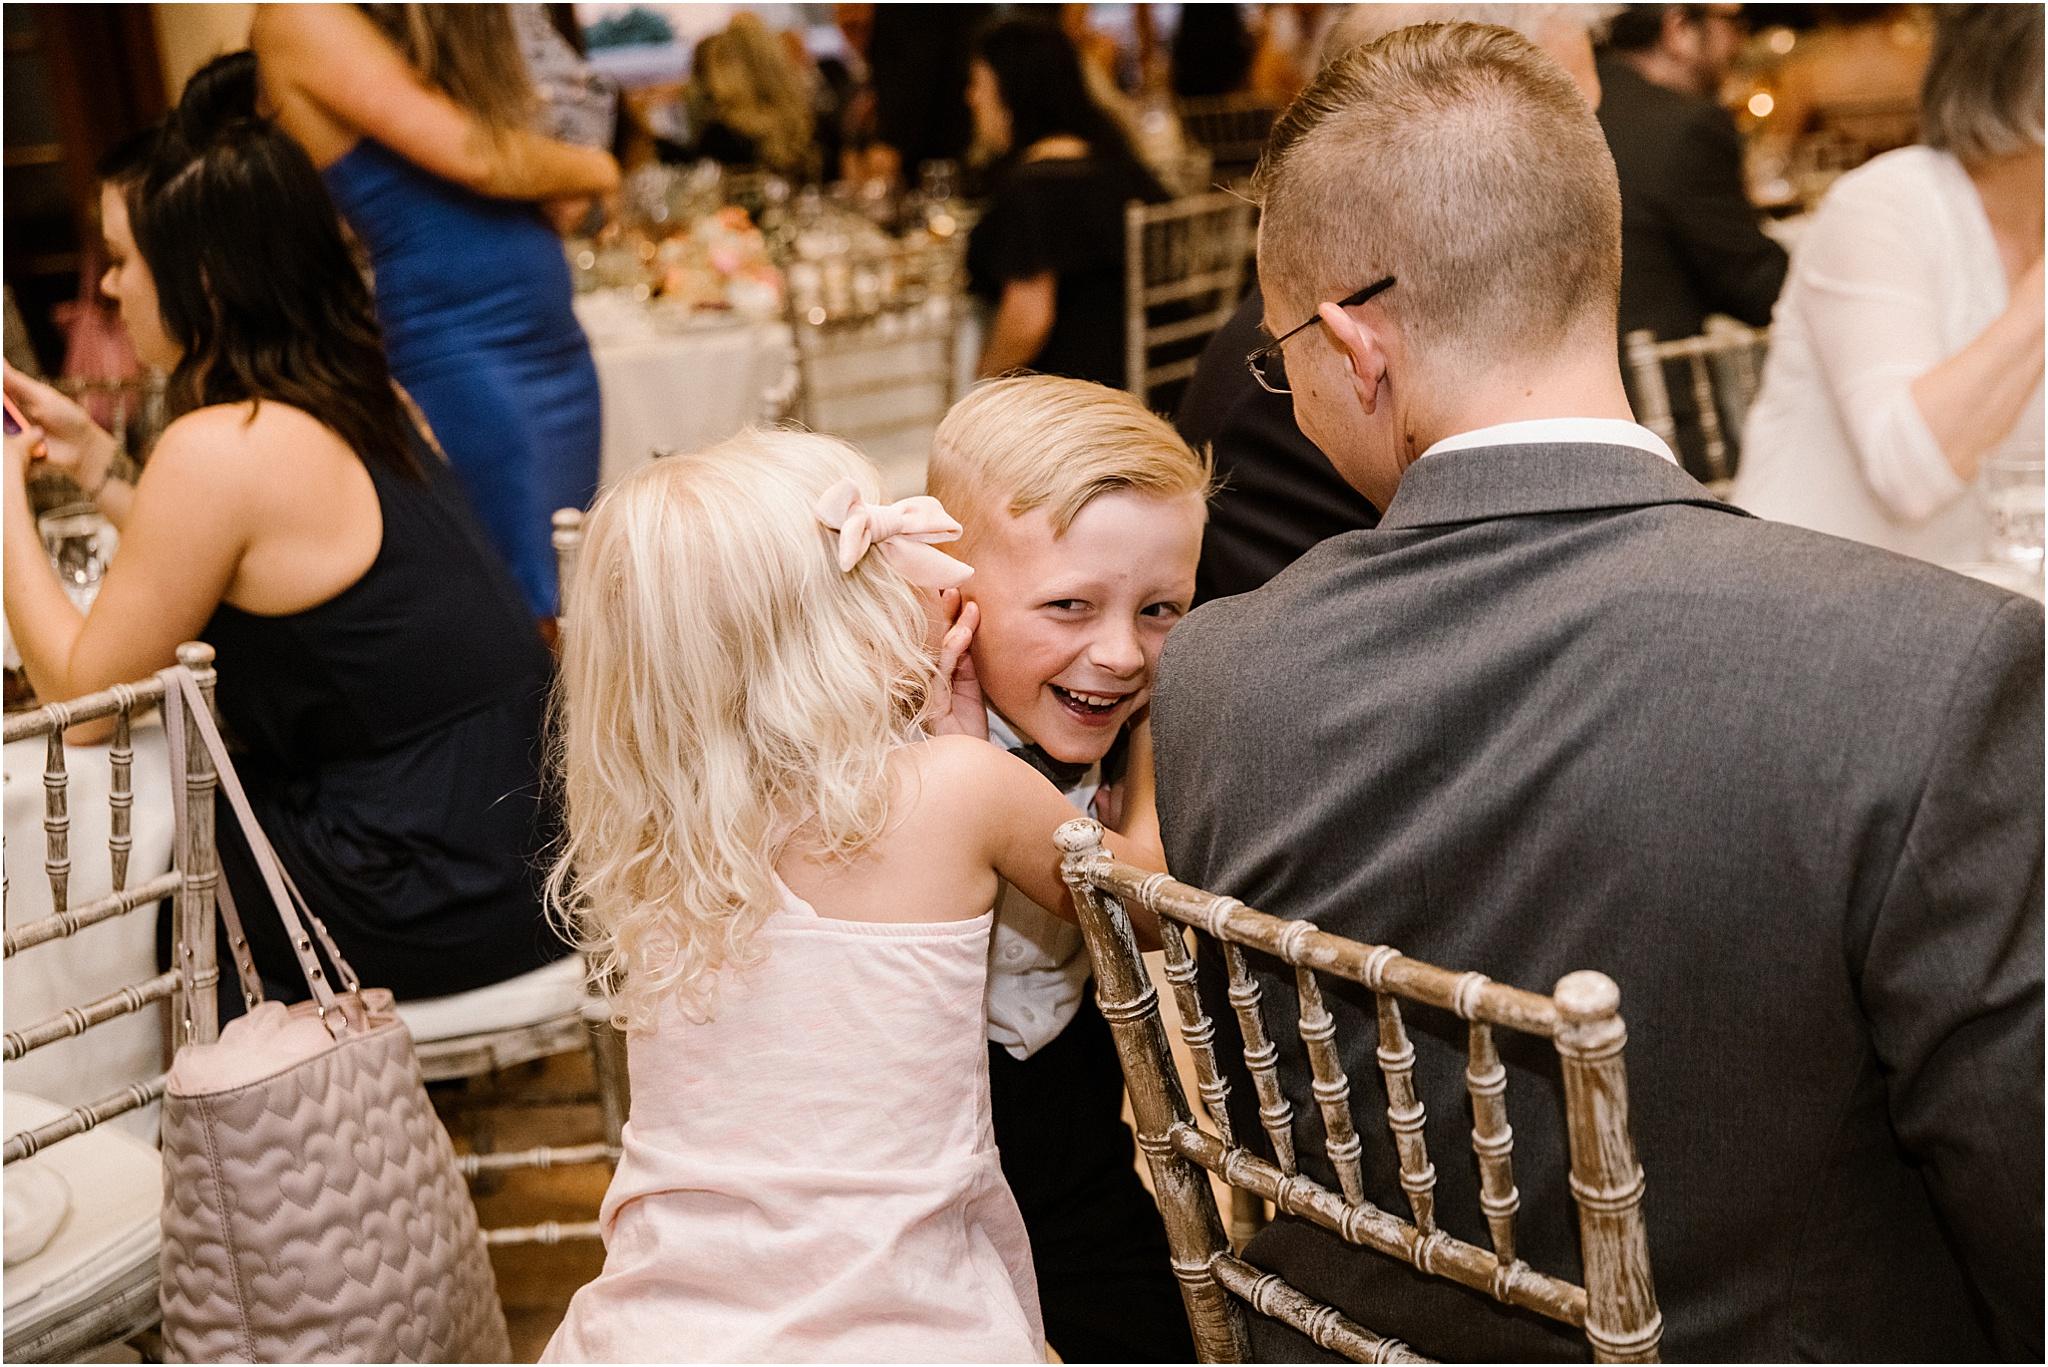 BLUE ROSE PHOTOGRAPHY SANTA FE WEDDING_57